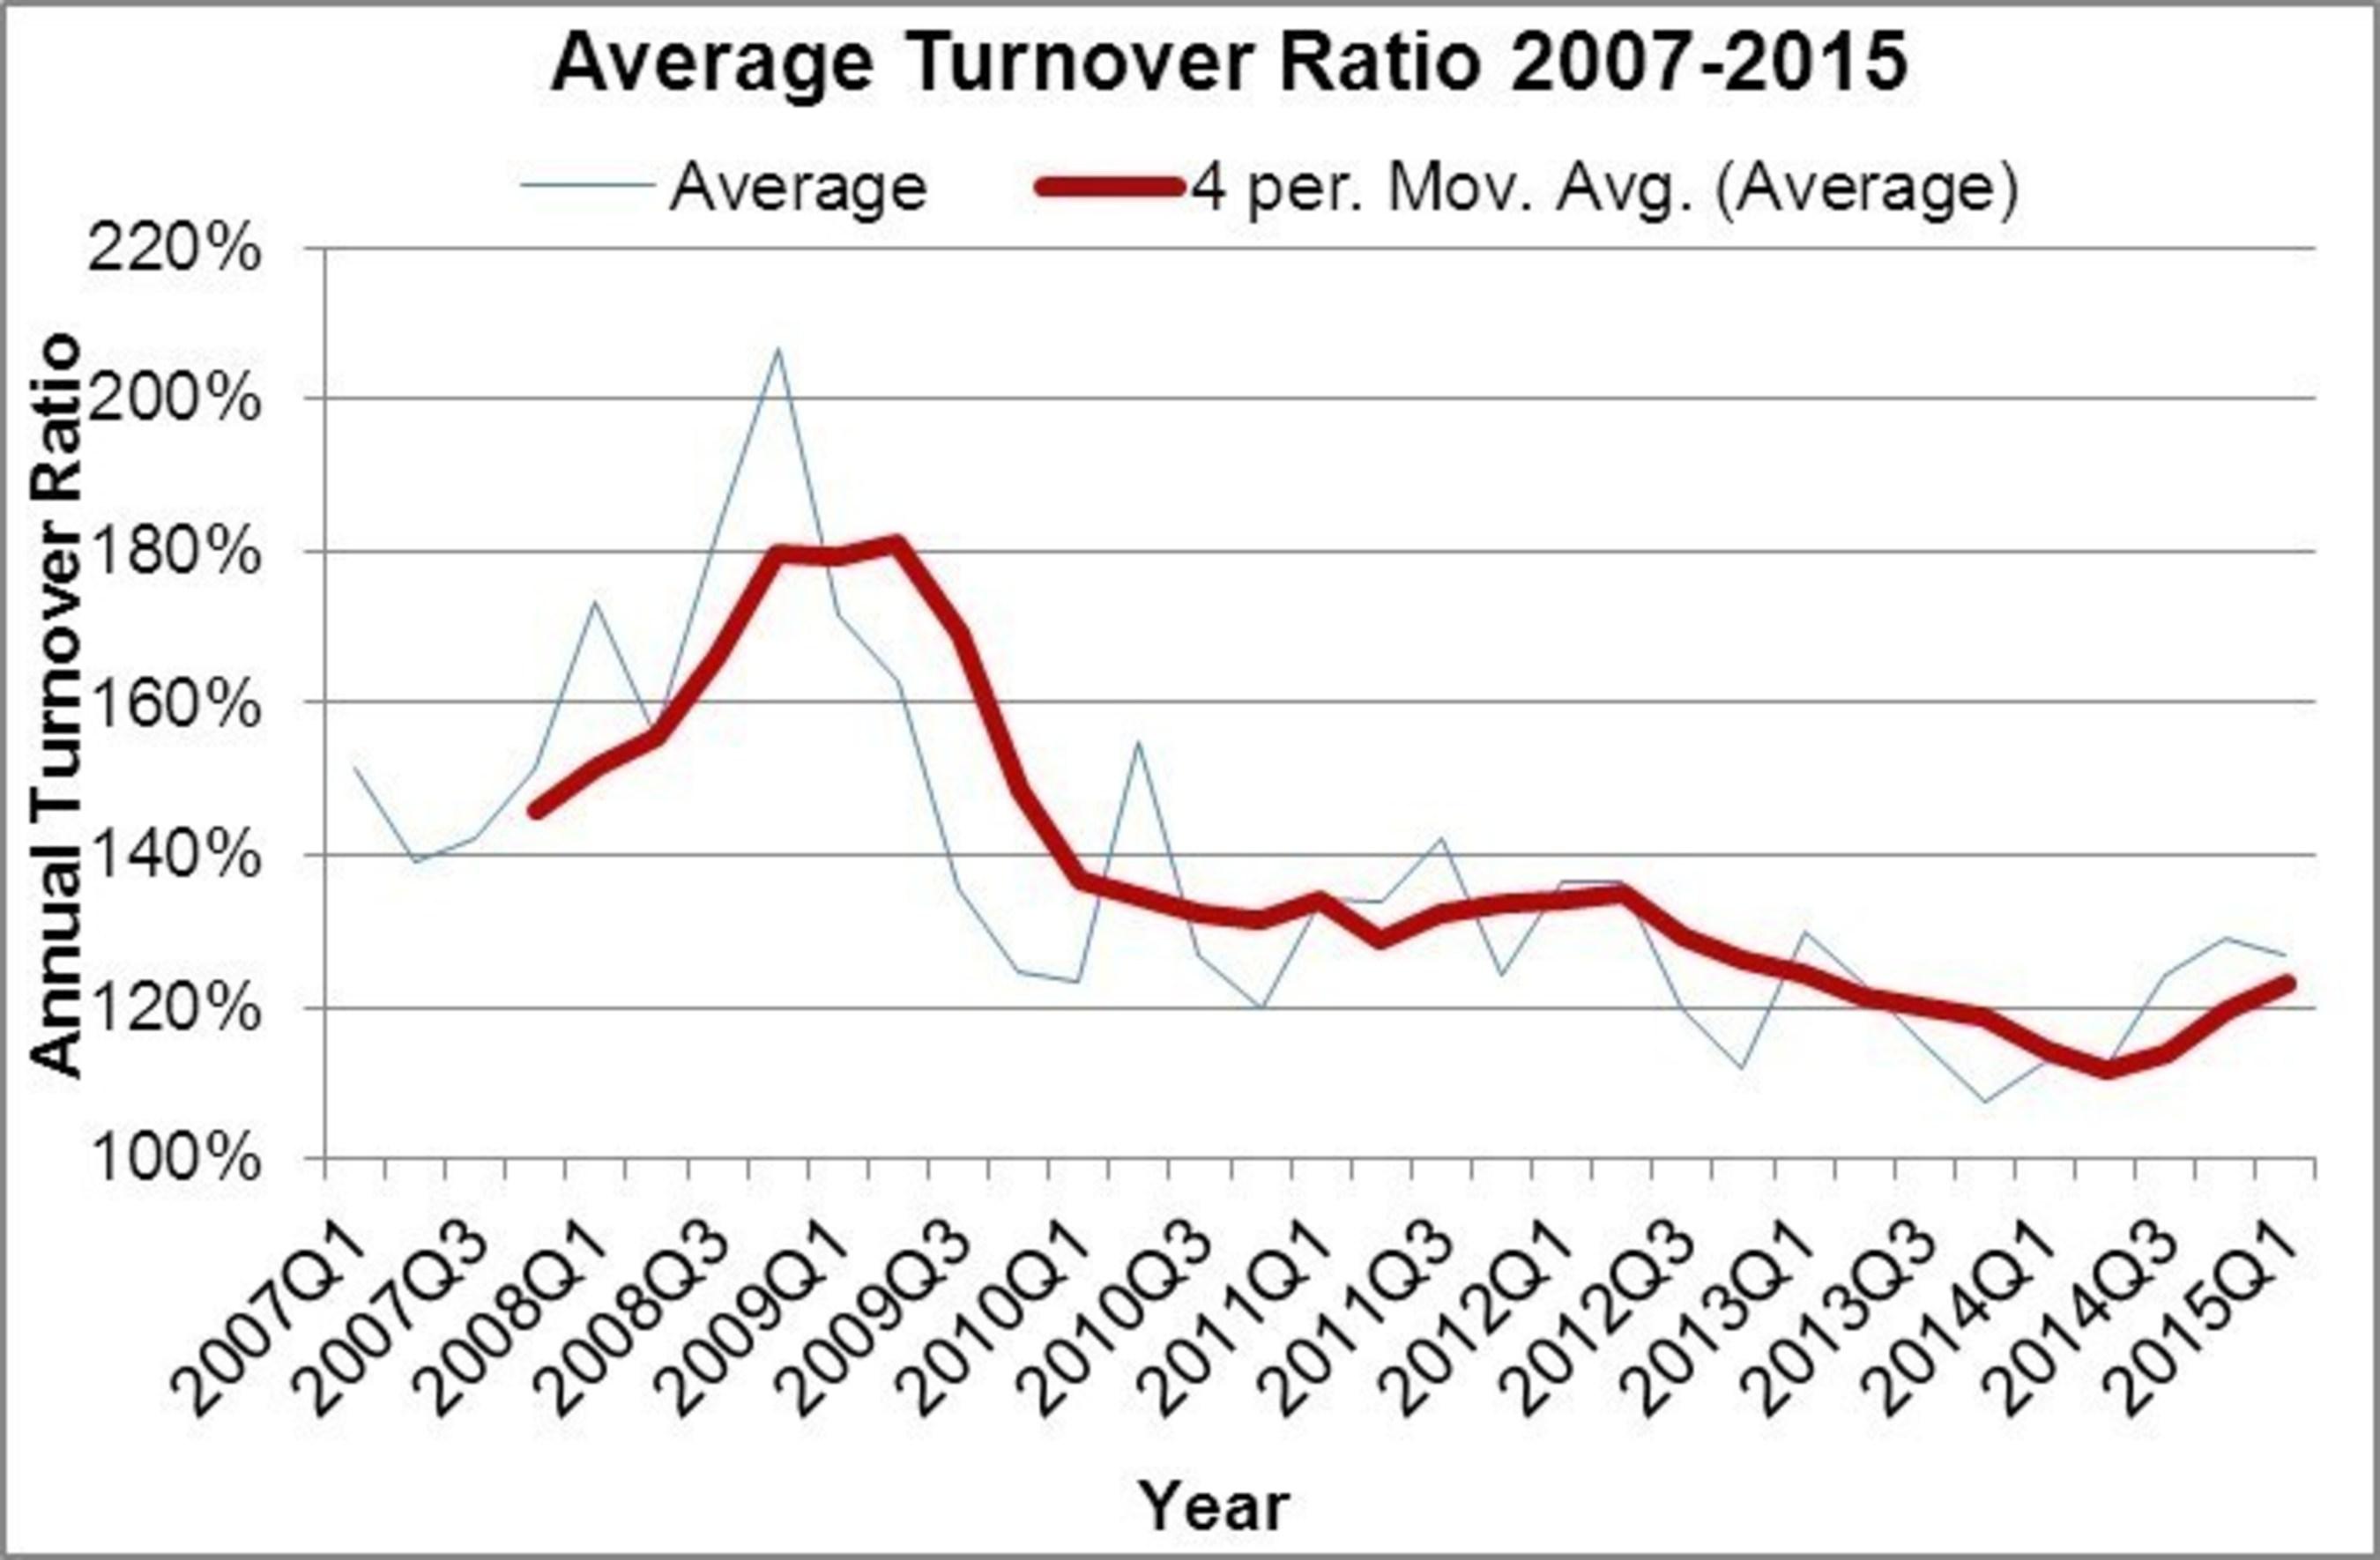 Average Turnover Ratio 2007-2015